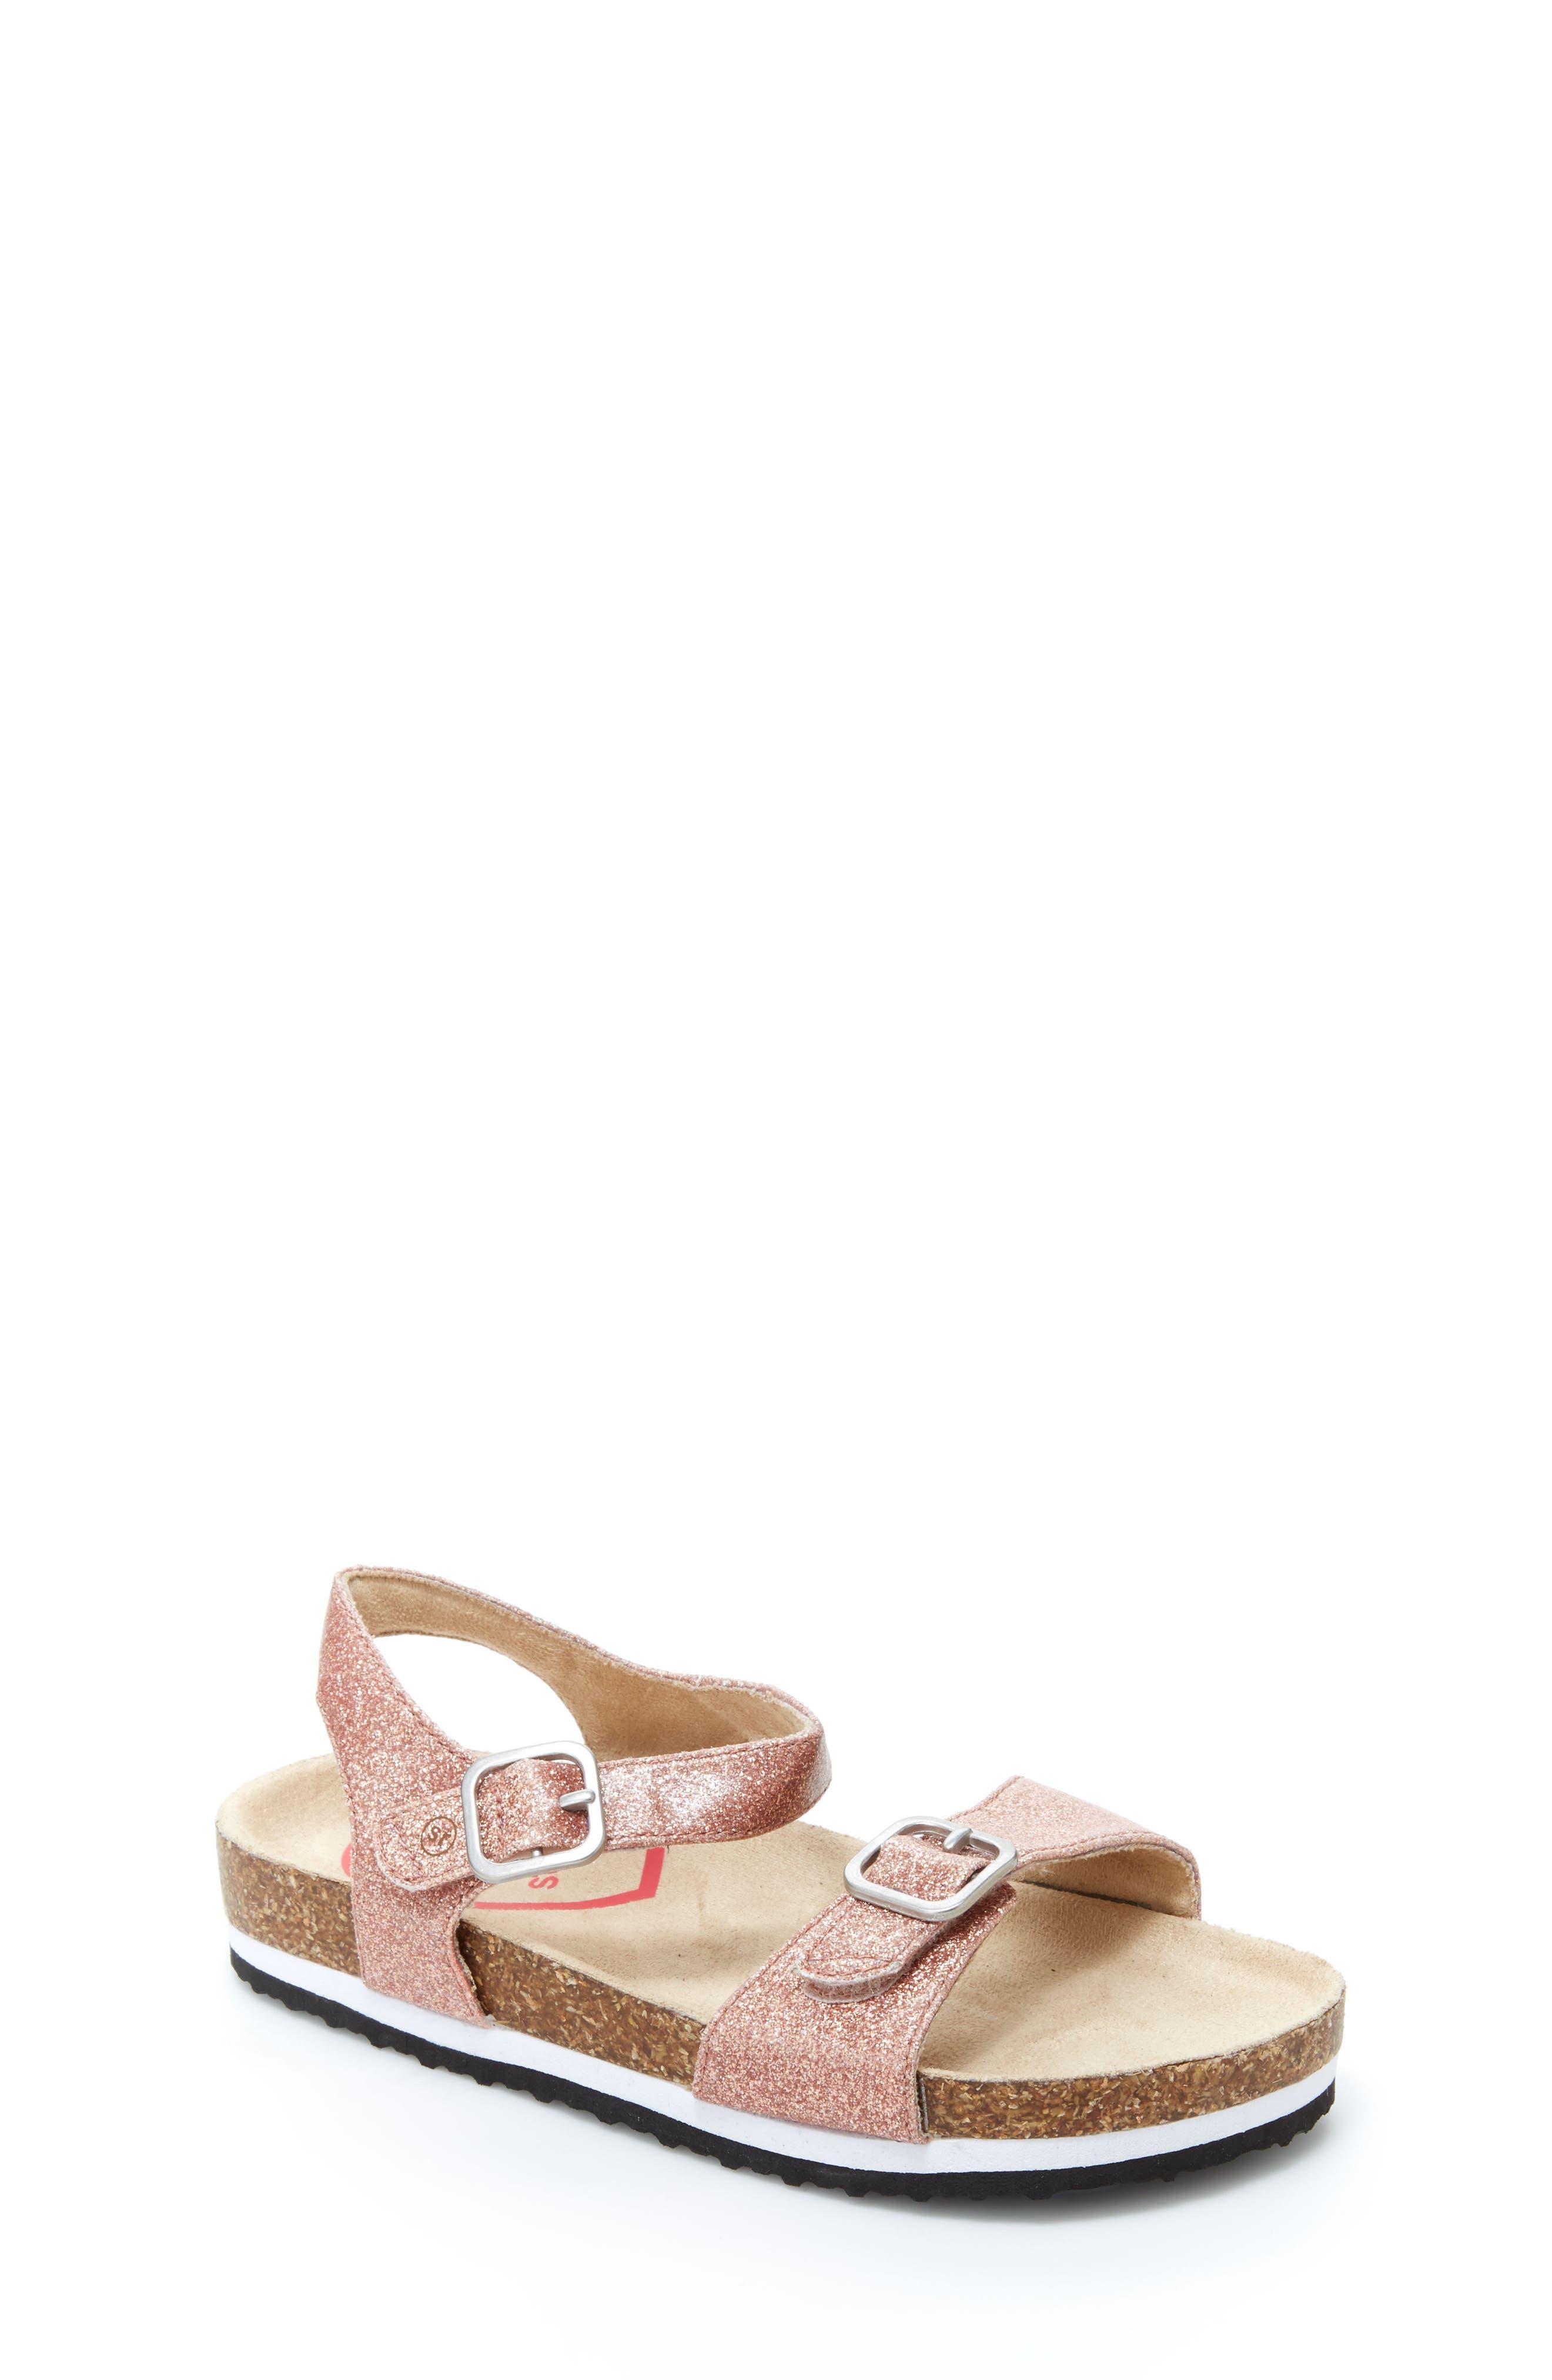 STRIDE RITE, Zuly Glitter Sandal, Main thumbnail 1, color, ROSE GOLD